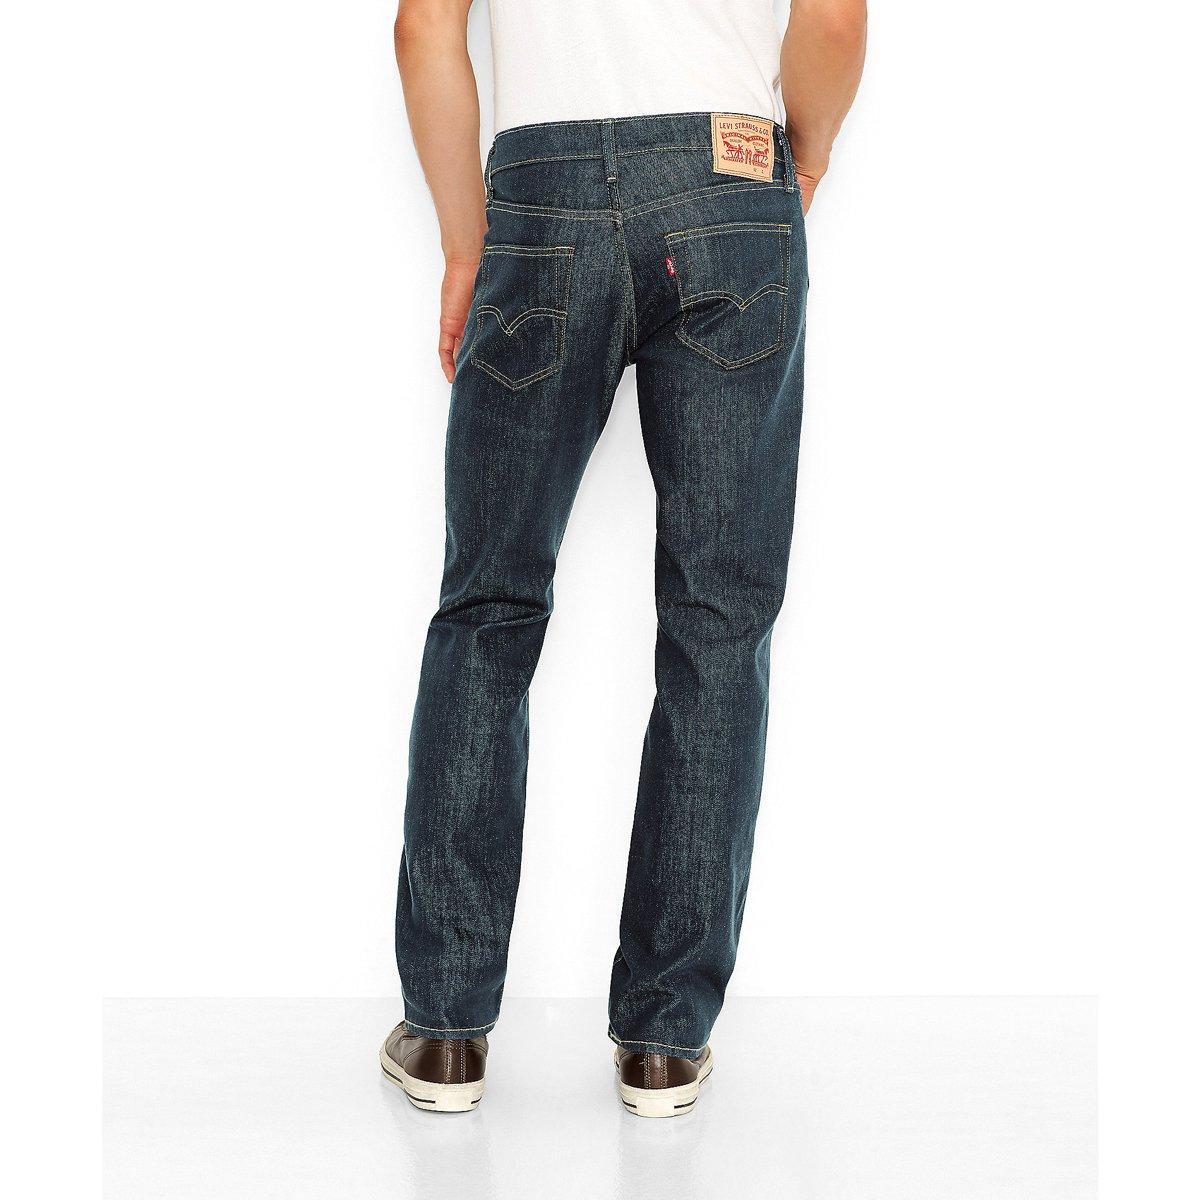 Jeans 513 Slim Straight Levi's para Caballero